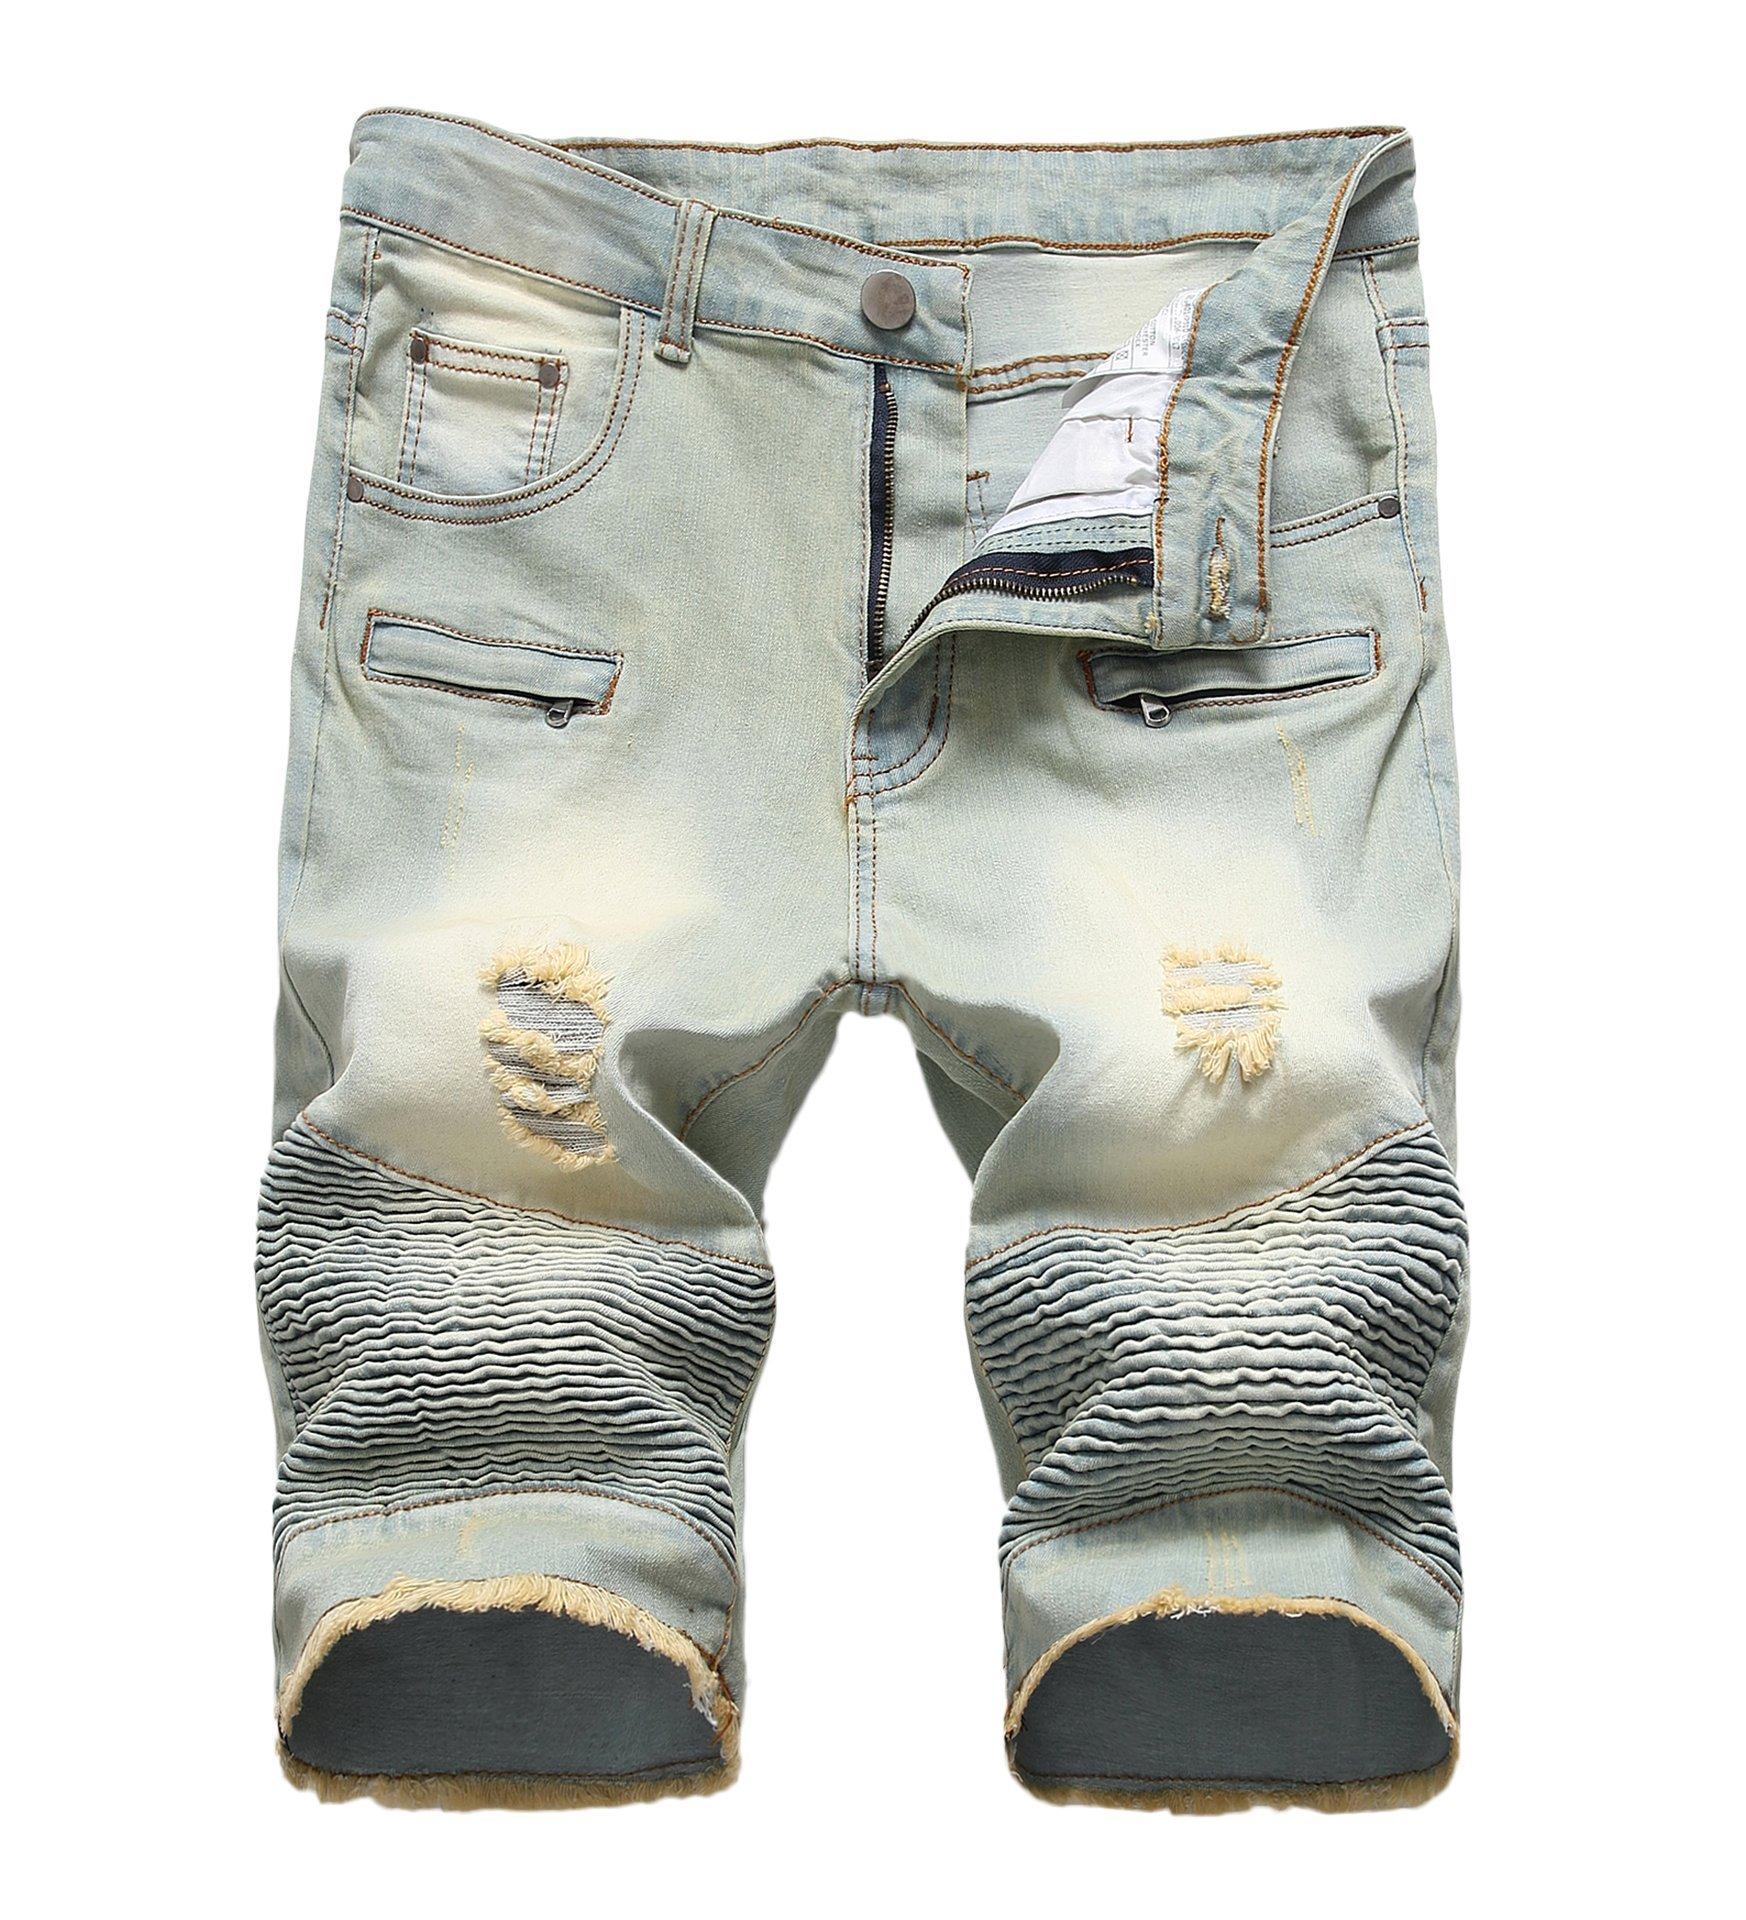 CLANNAD Men's Moto Biker Shorts Jeans Zipper Denim Casual Slim Shorts with Hole Vintage Blue 30 by CLANNAD (Image #1)